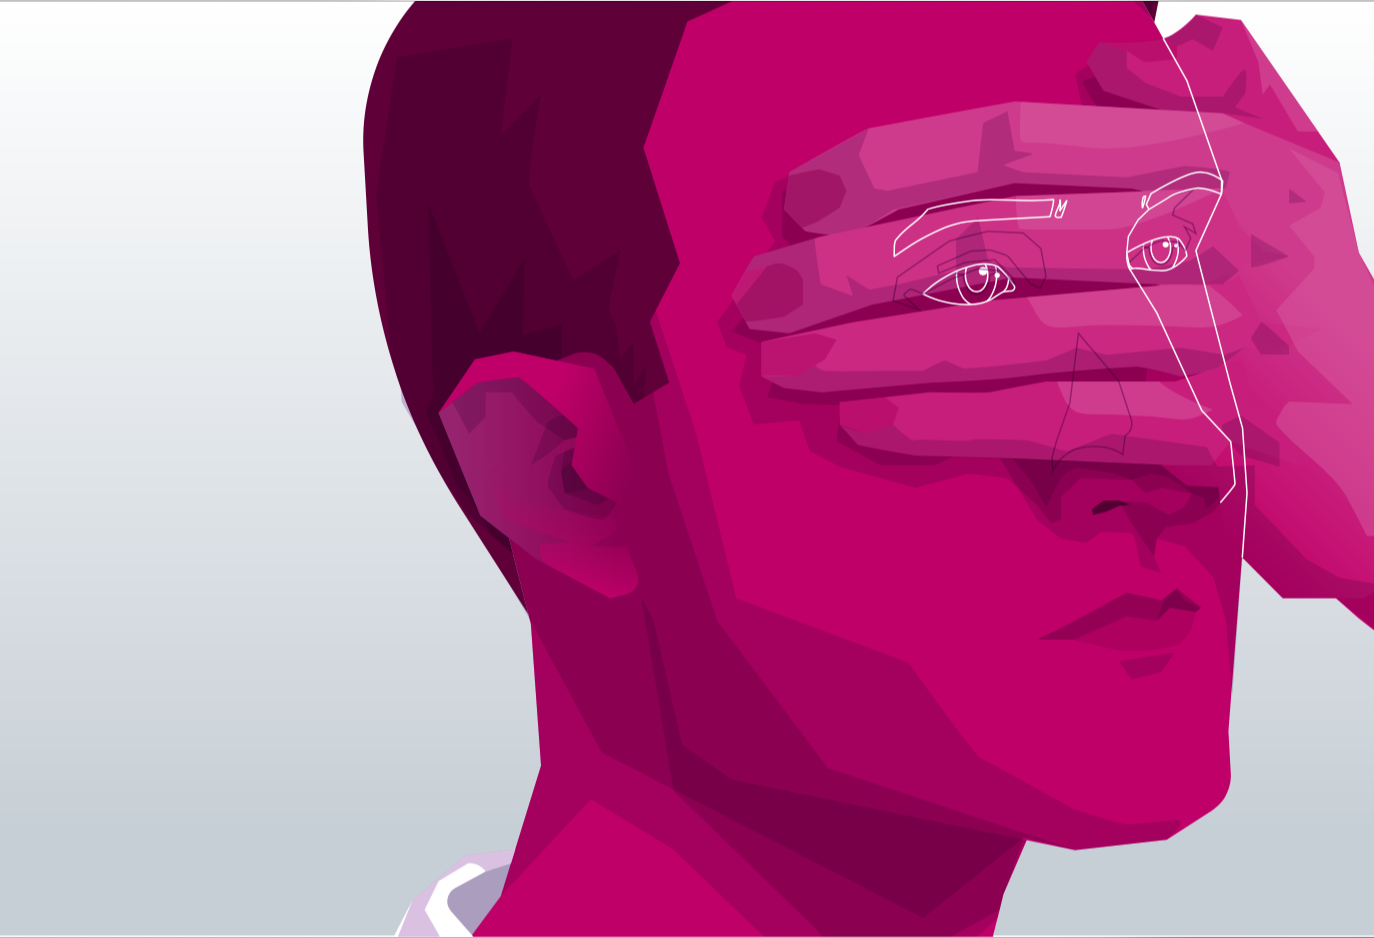 Uncovering Blindspots